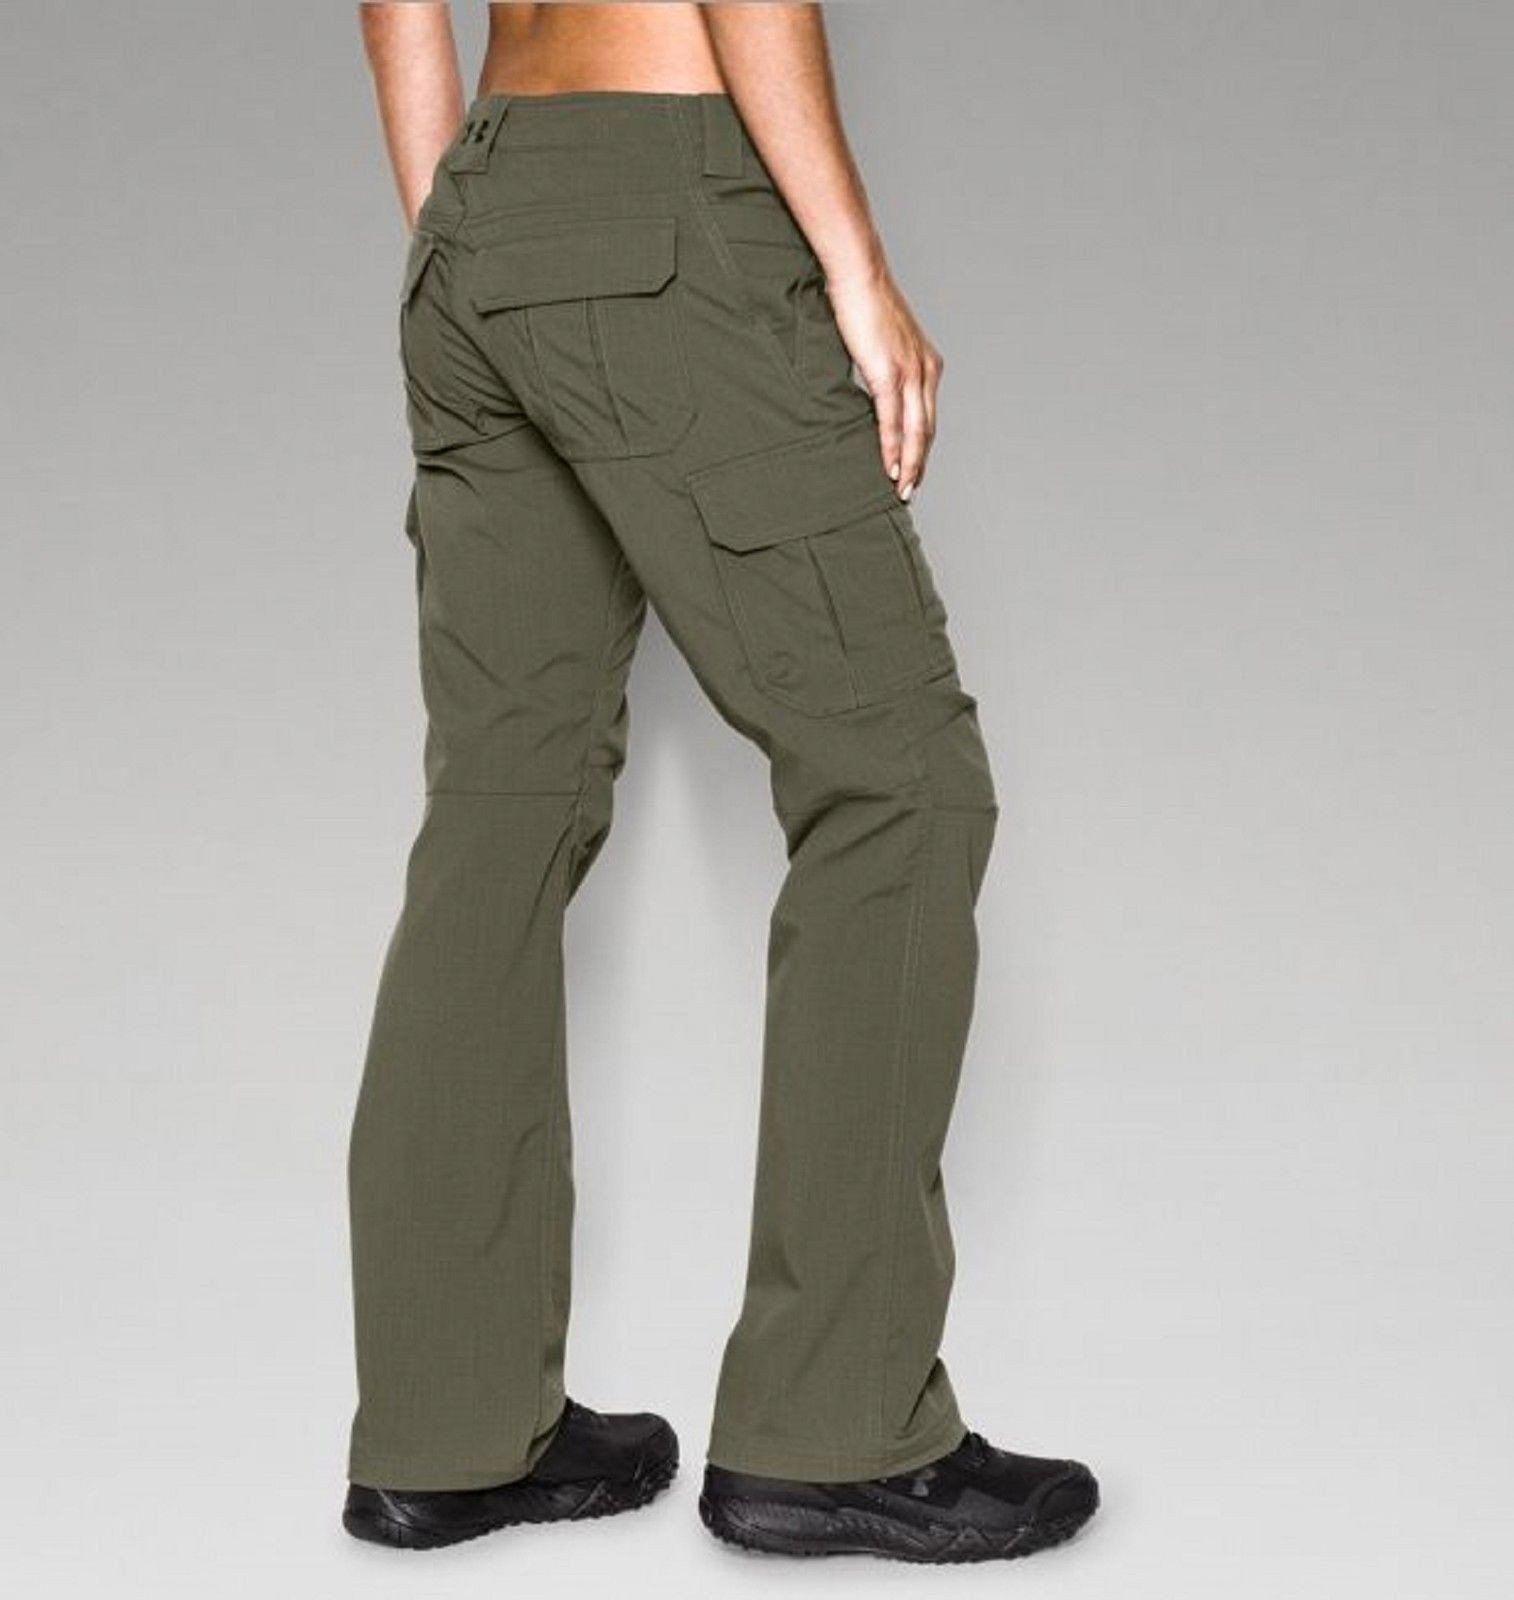 Under Armour Womens Tactical Patrol Pant Ua Loose Fit Field Duty Car Grunt Force Hikingpants Pantalon De Tela Mujer Pantalones Cargo Mujer Ropa Montana